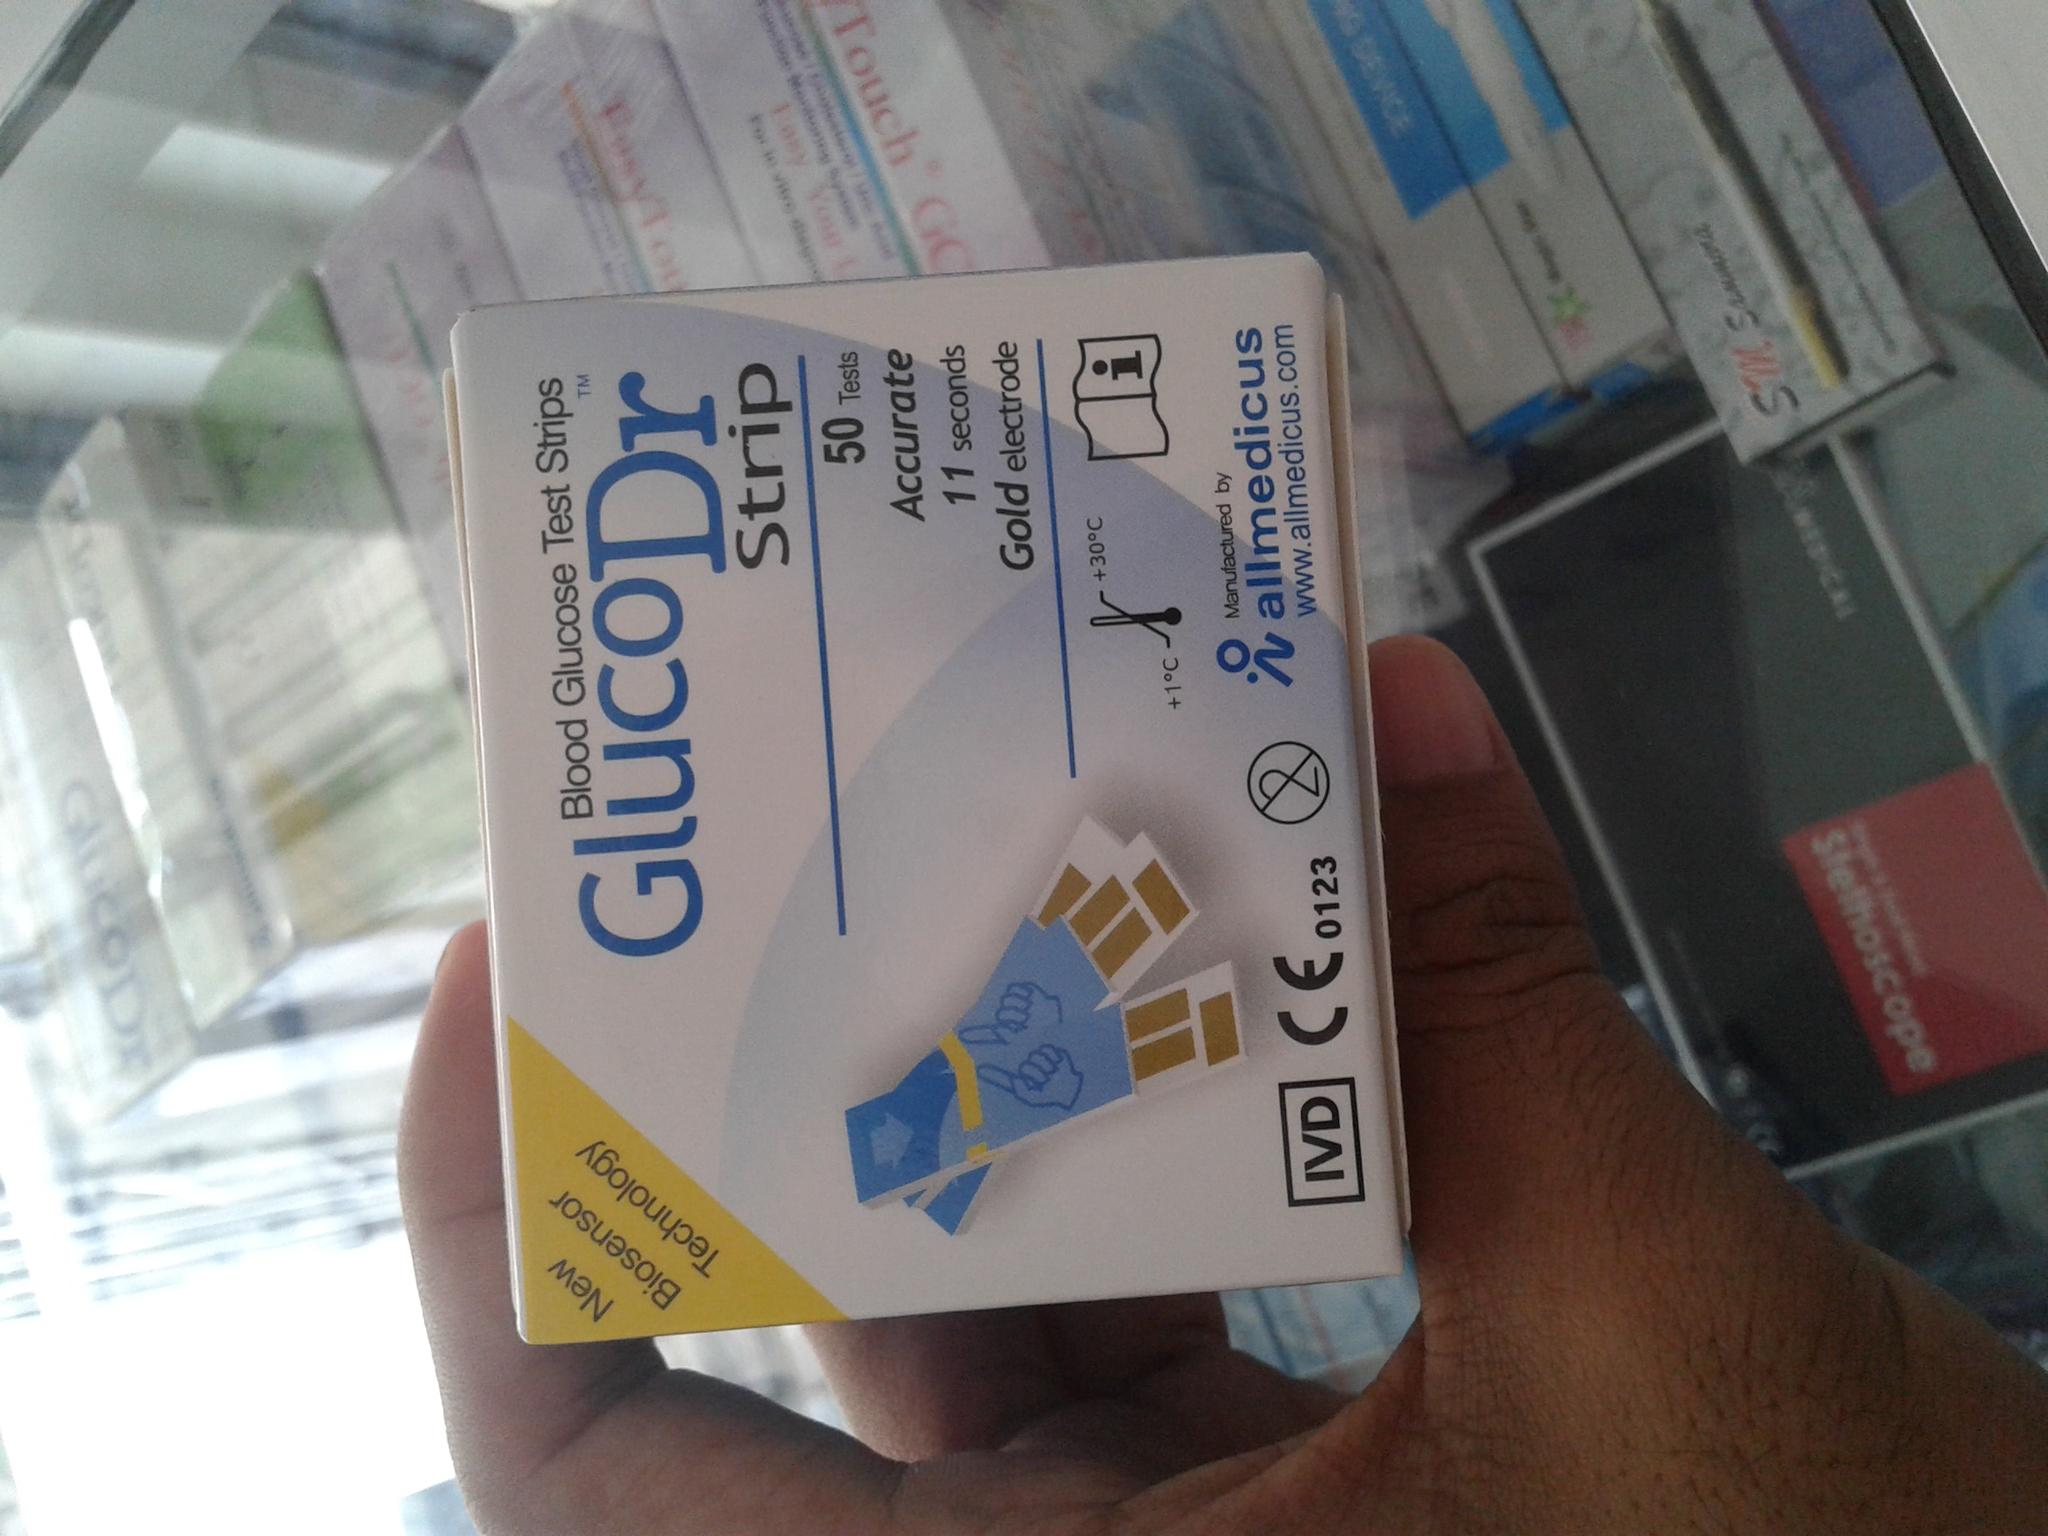 GLUCO DR BIO Sensor 8, Strip Gula darah glucodr